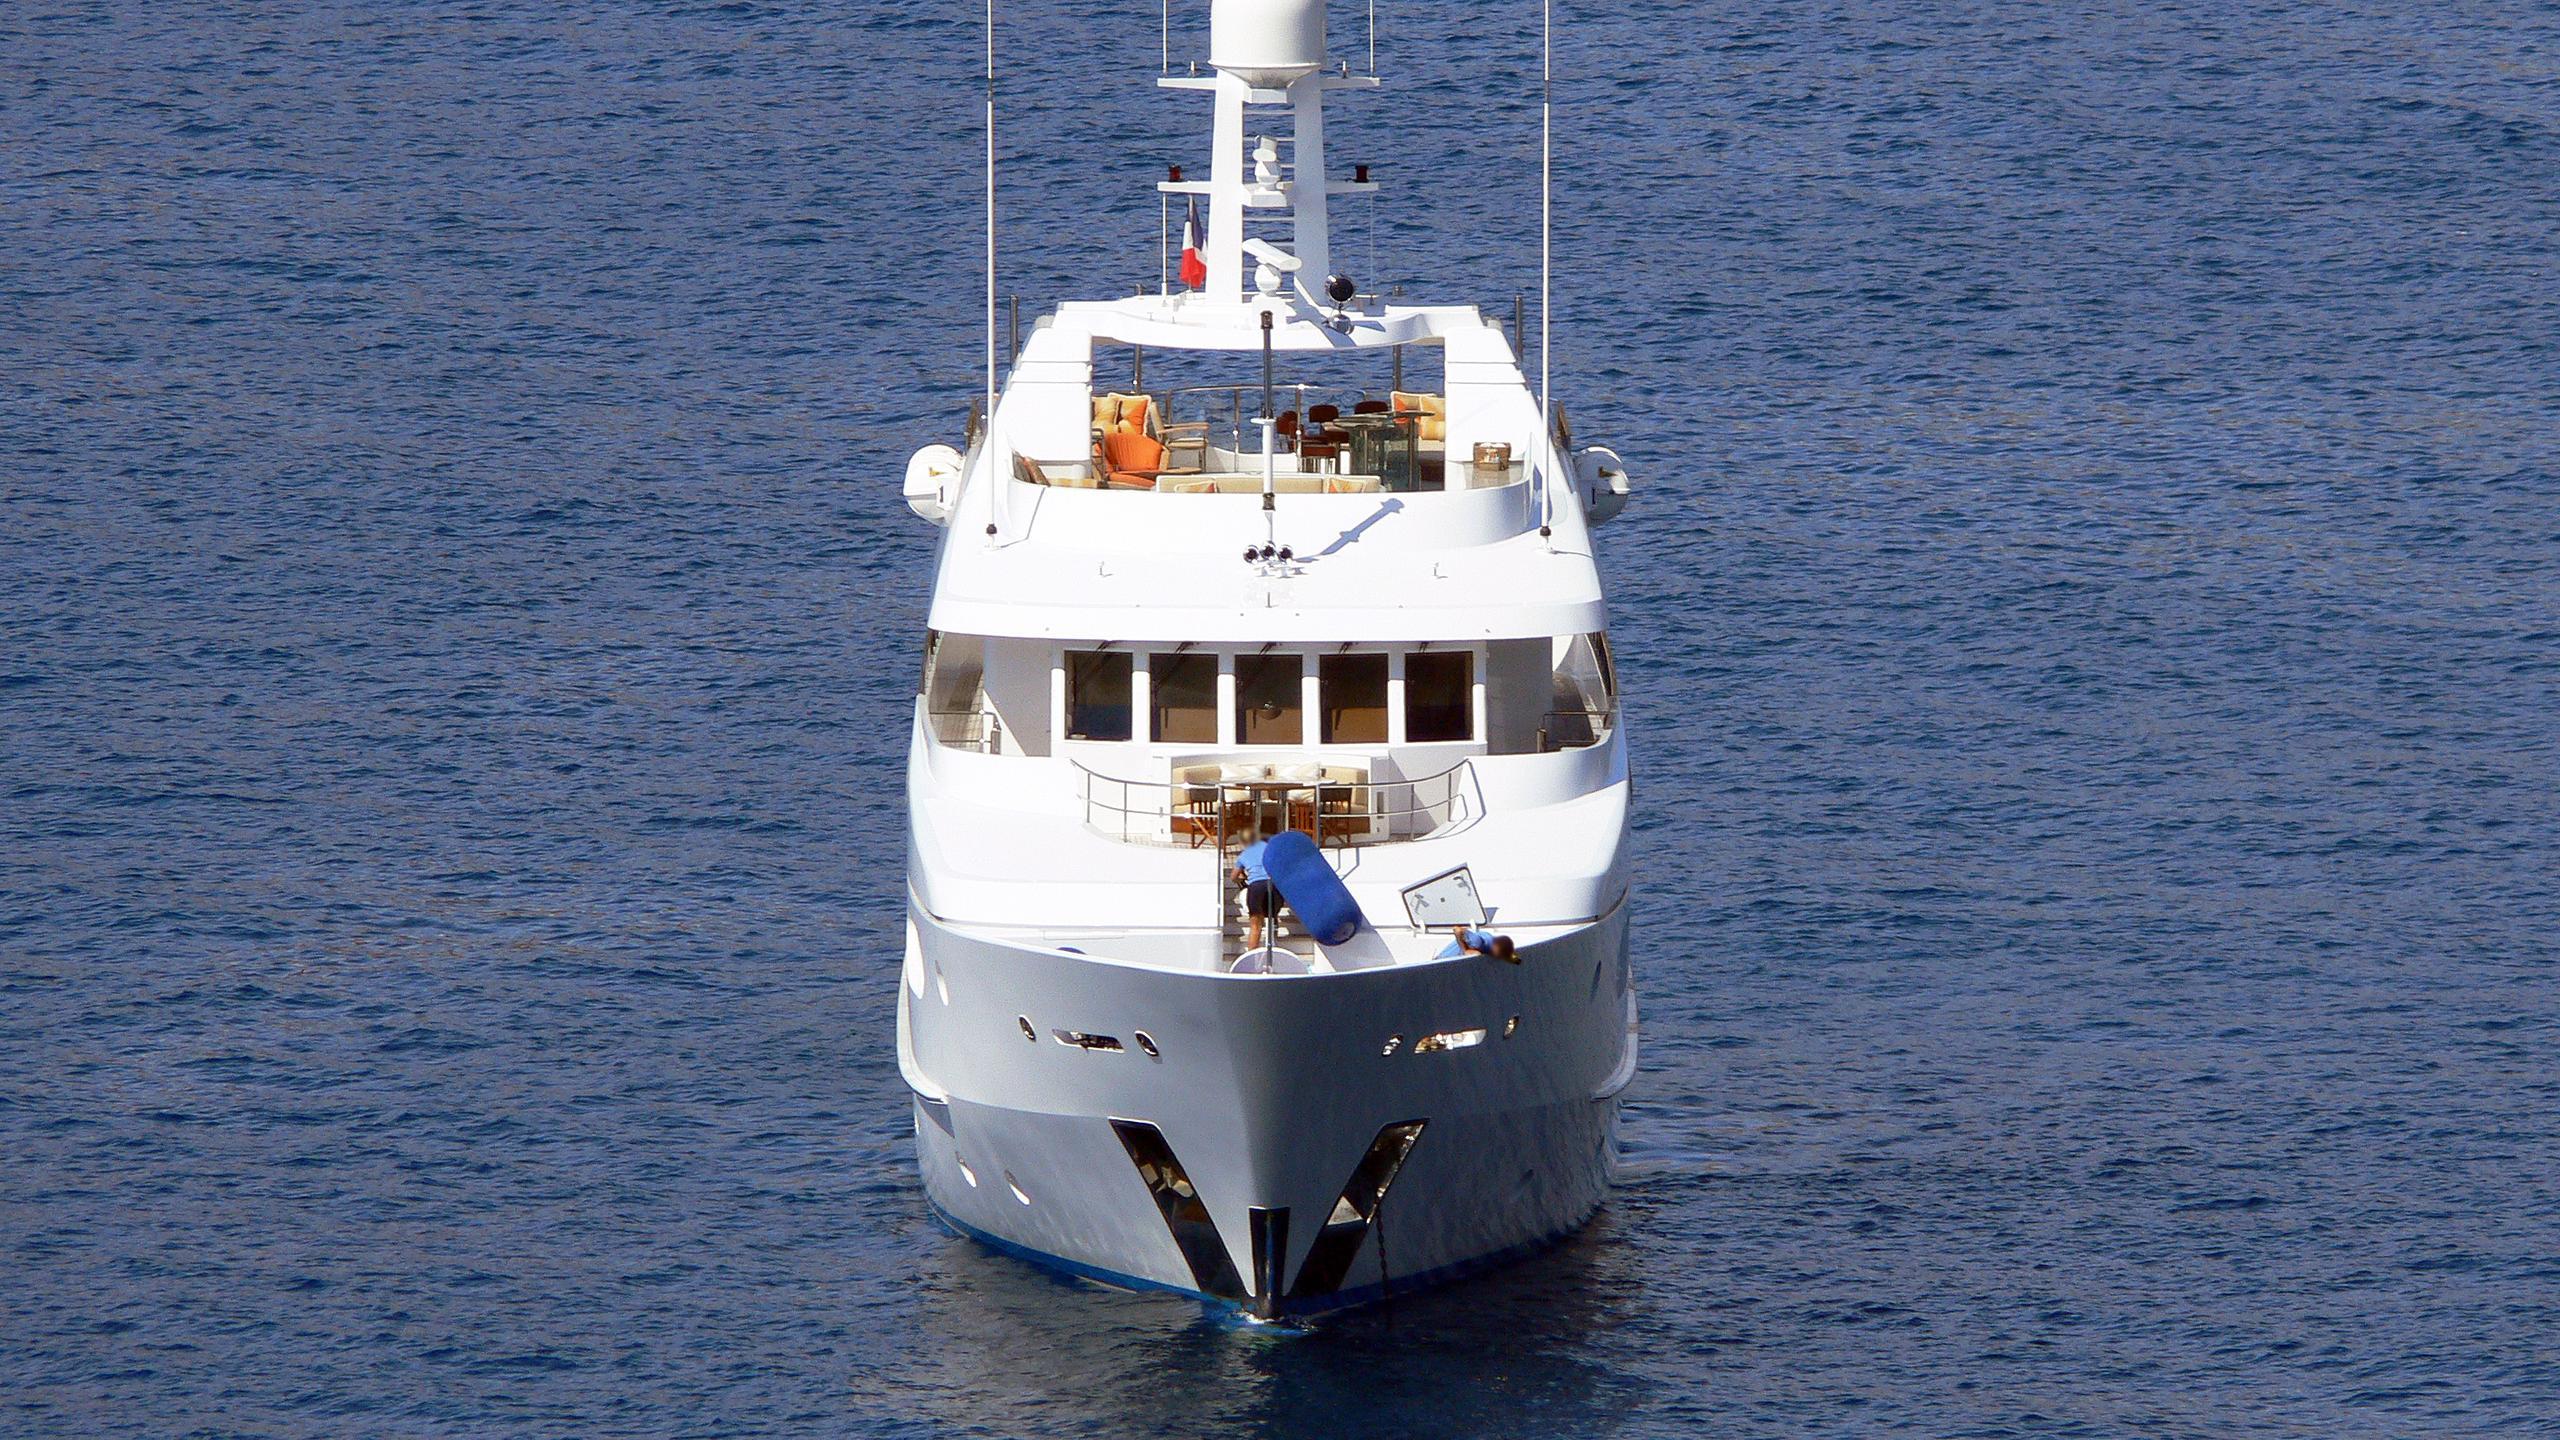 perle-bleue-motor-yacht-hakvoort-2007-38m-bow